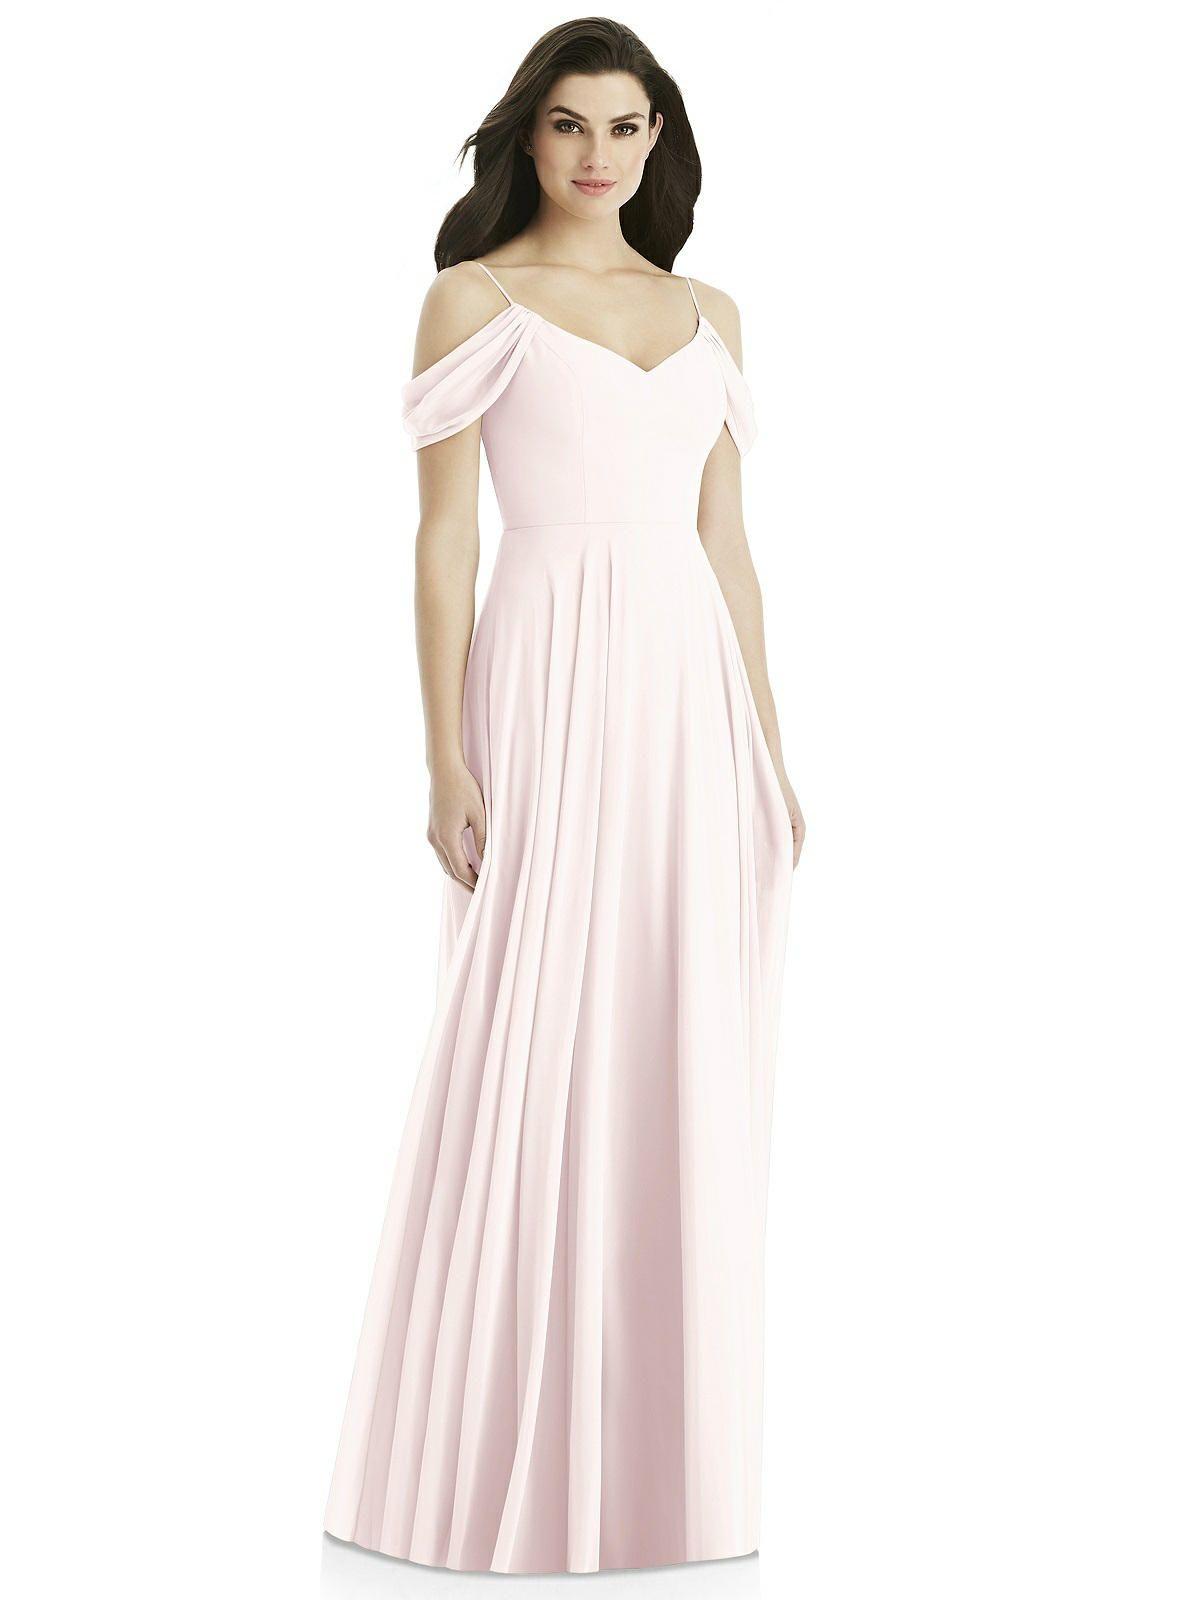 05b49886721 Studio Design Bridesmaid Dress 4525